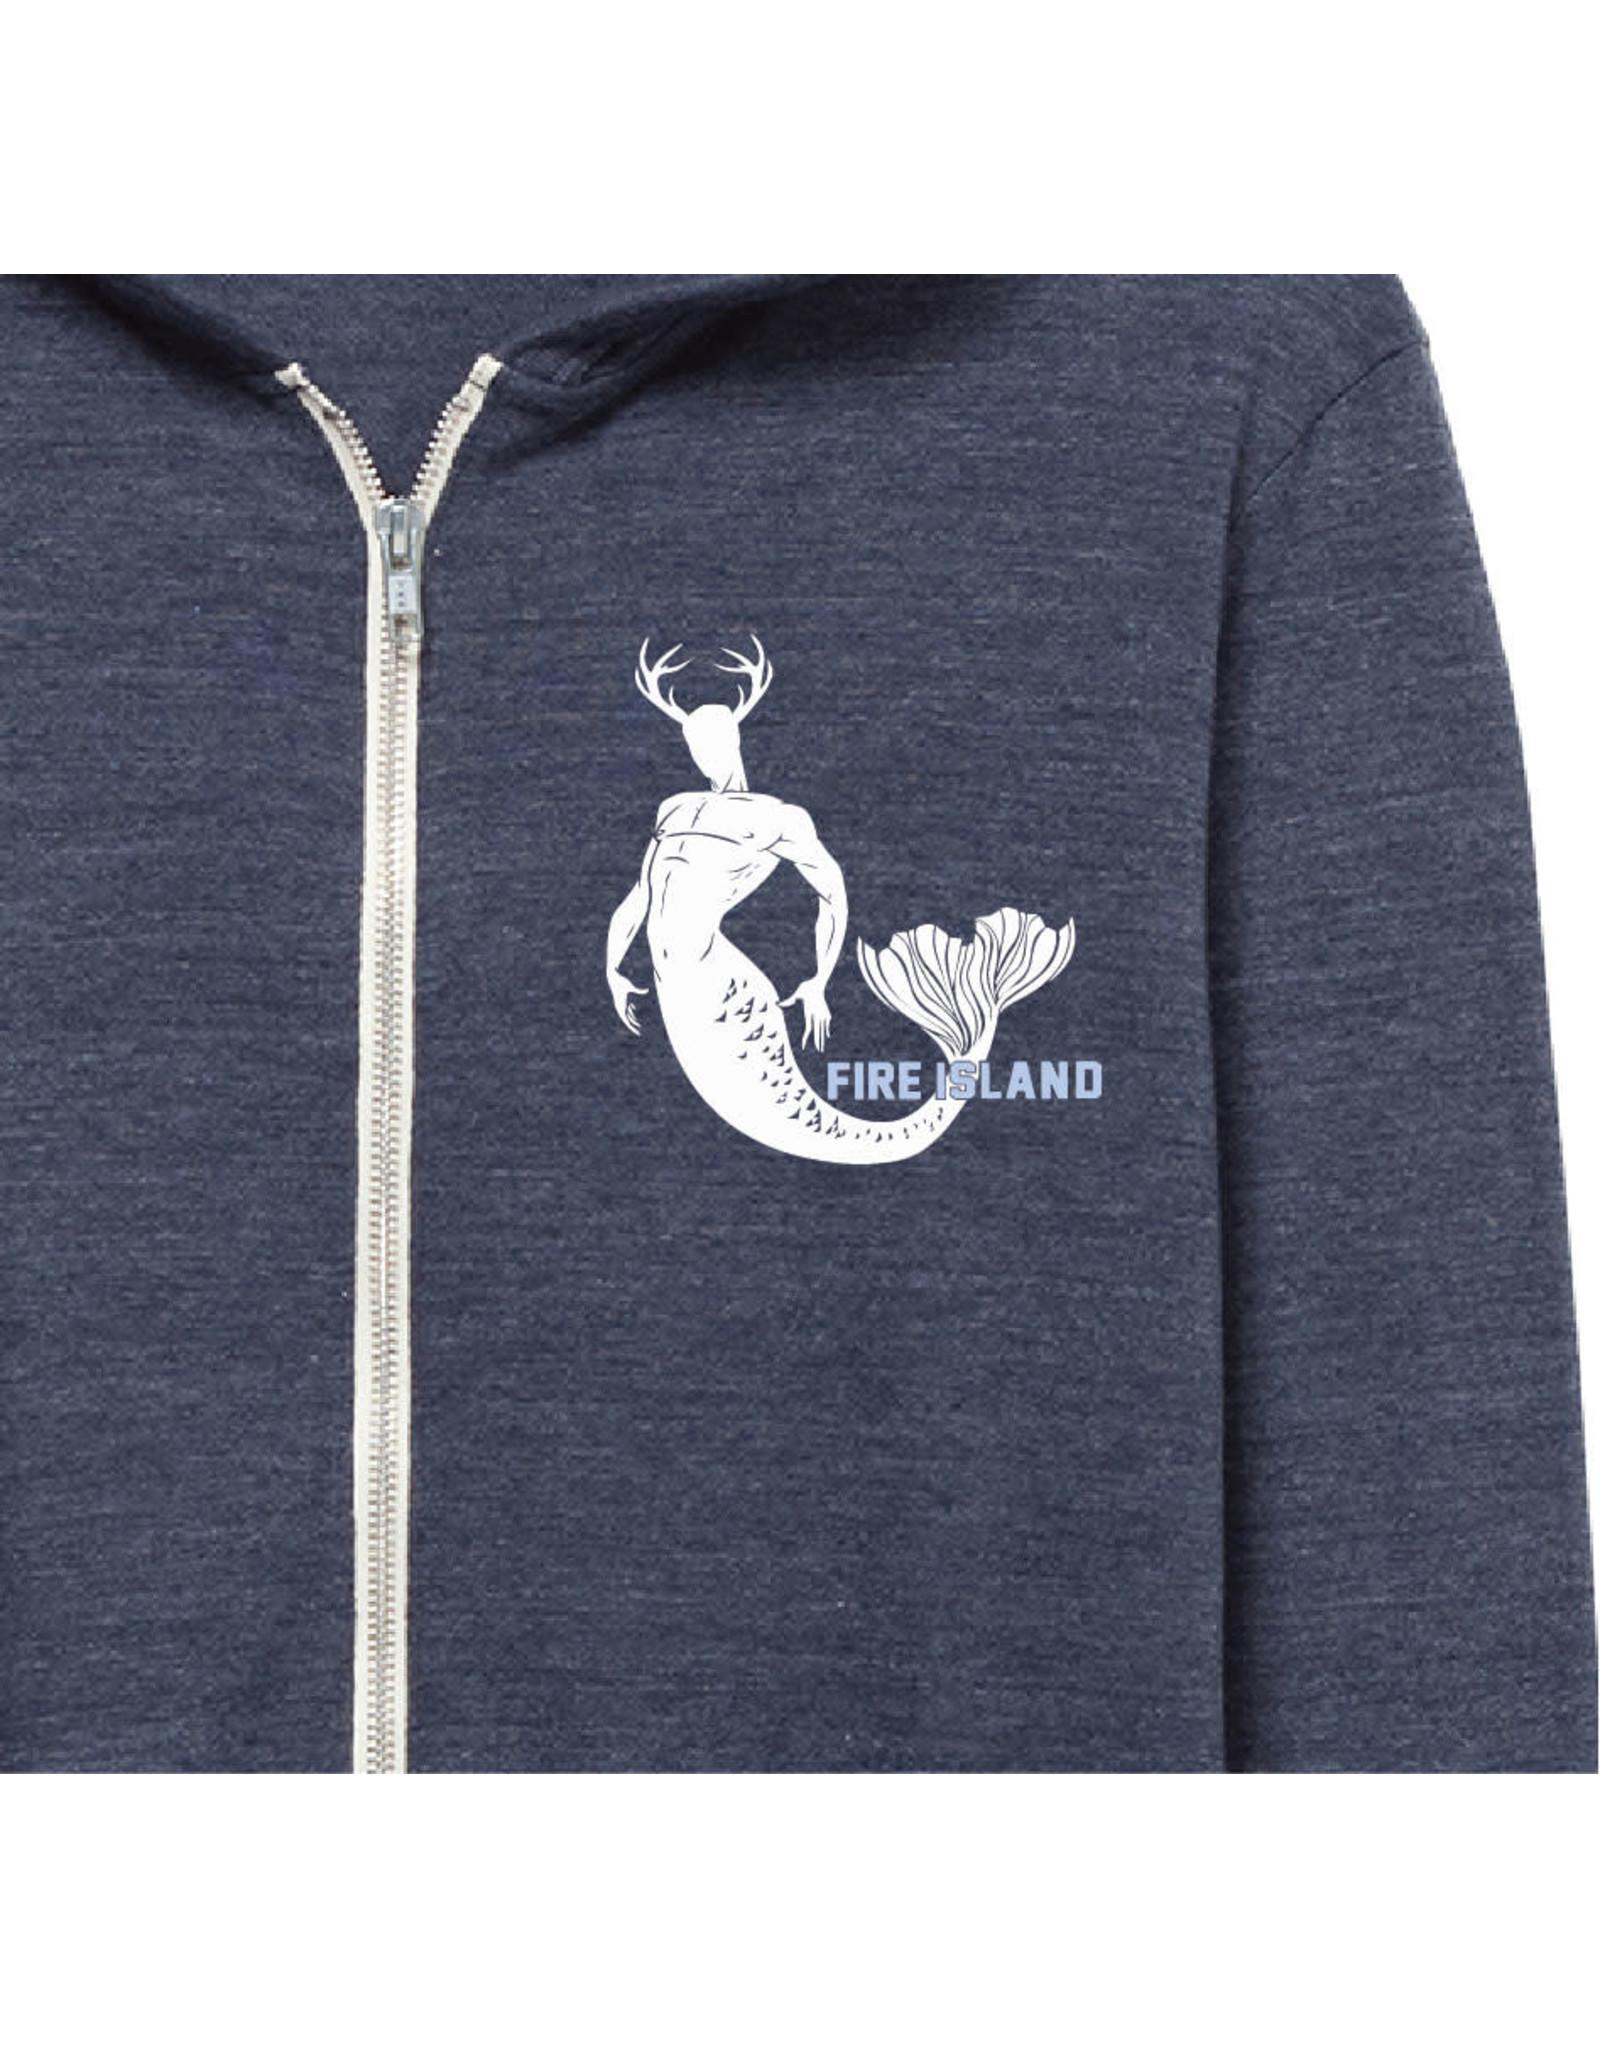 Alternative Apparal Merbuck Eco Jersey Zip Up Hoody